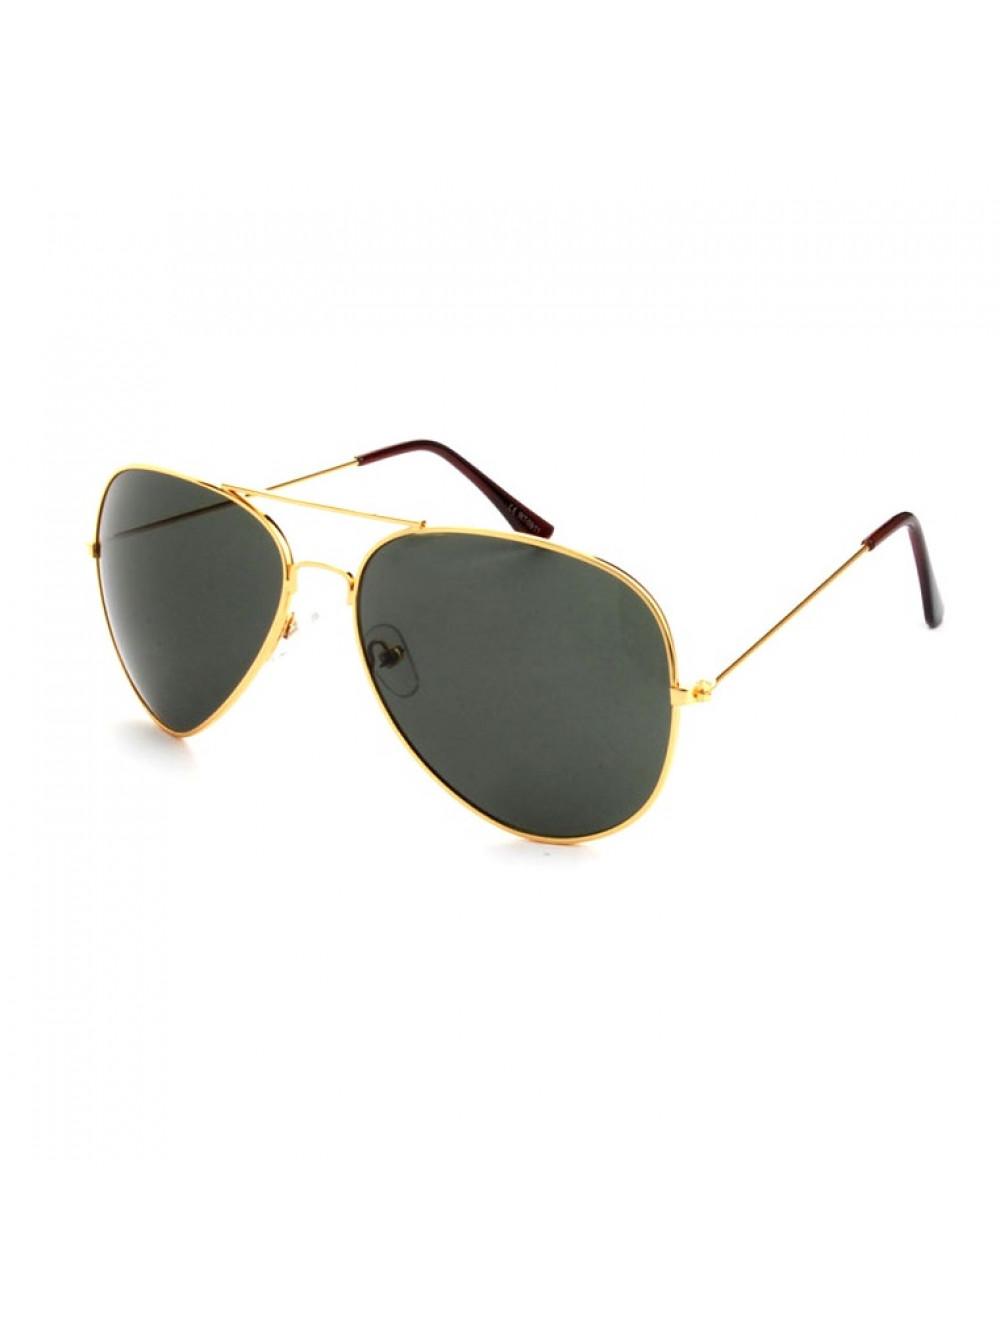 17f3514b5 Slnečné okuliare Aviator Pilot Top Gun polarizačné